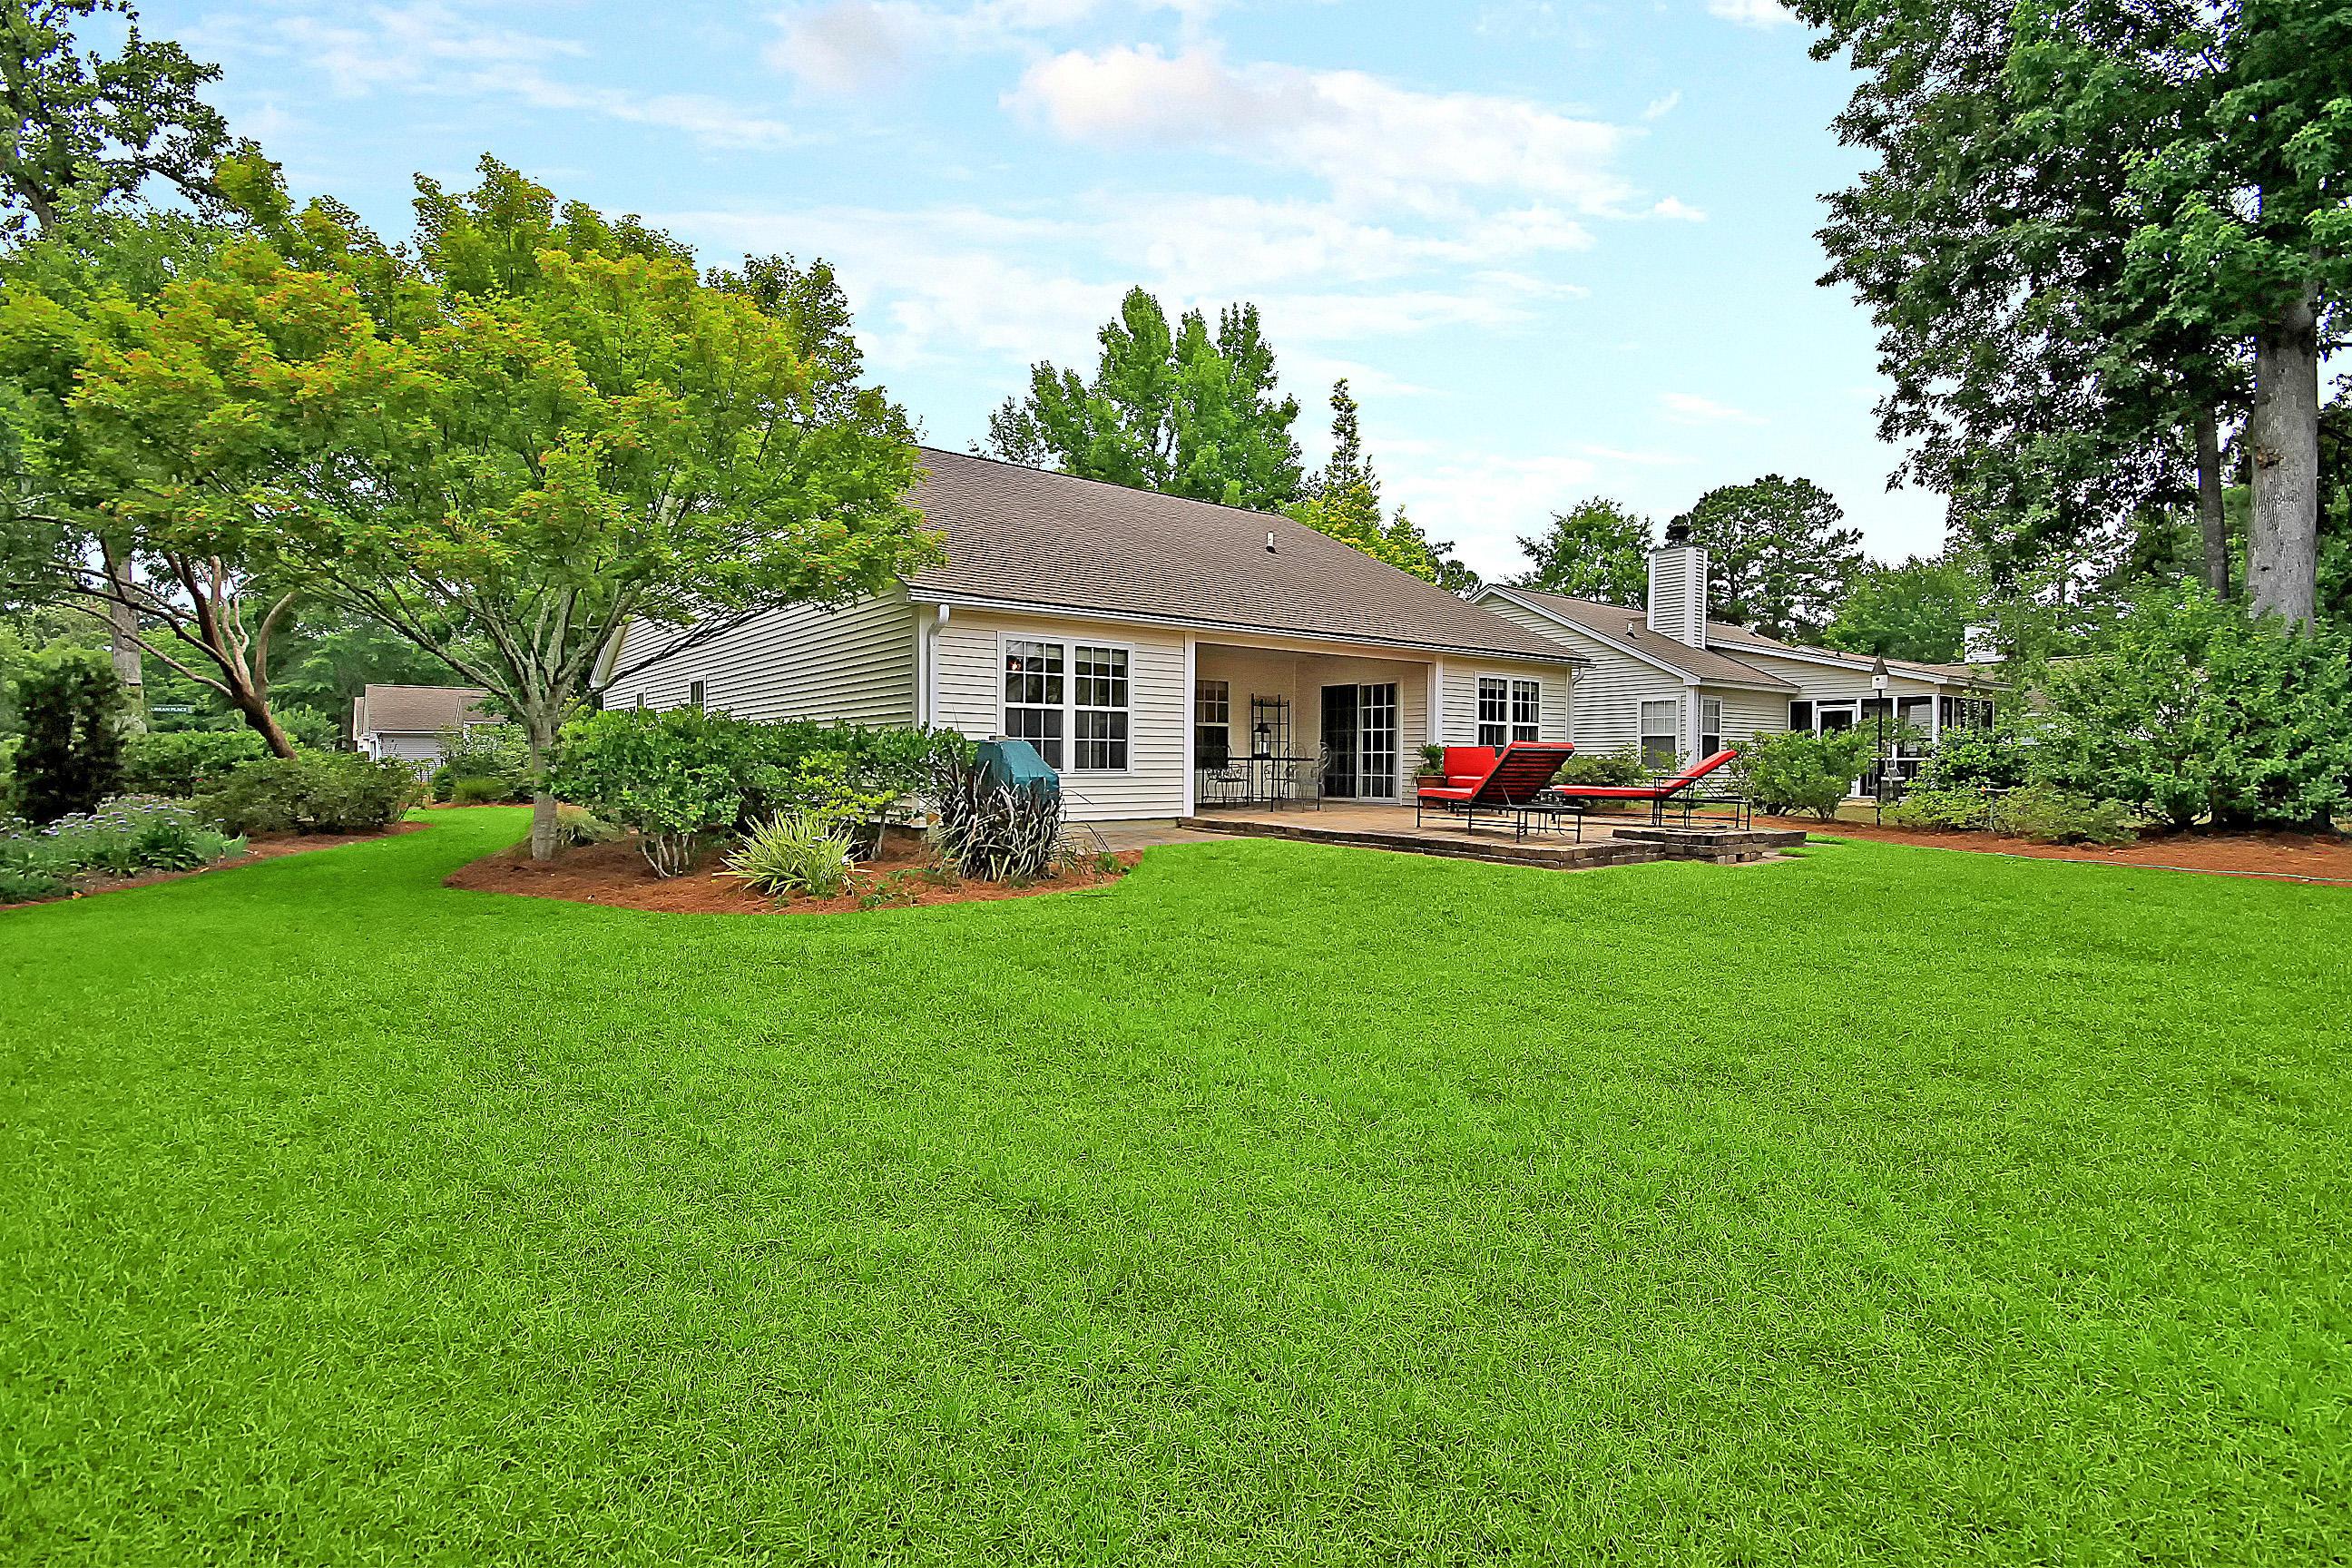 Planters Pointe Homes For Sale - 2863 Curran, Mount Pleasant, SC - 11